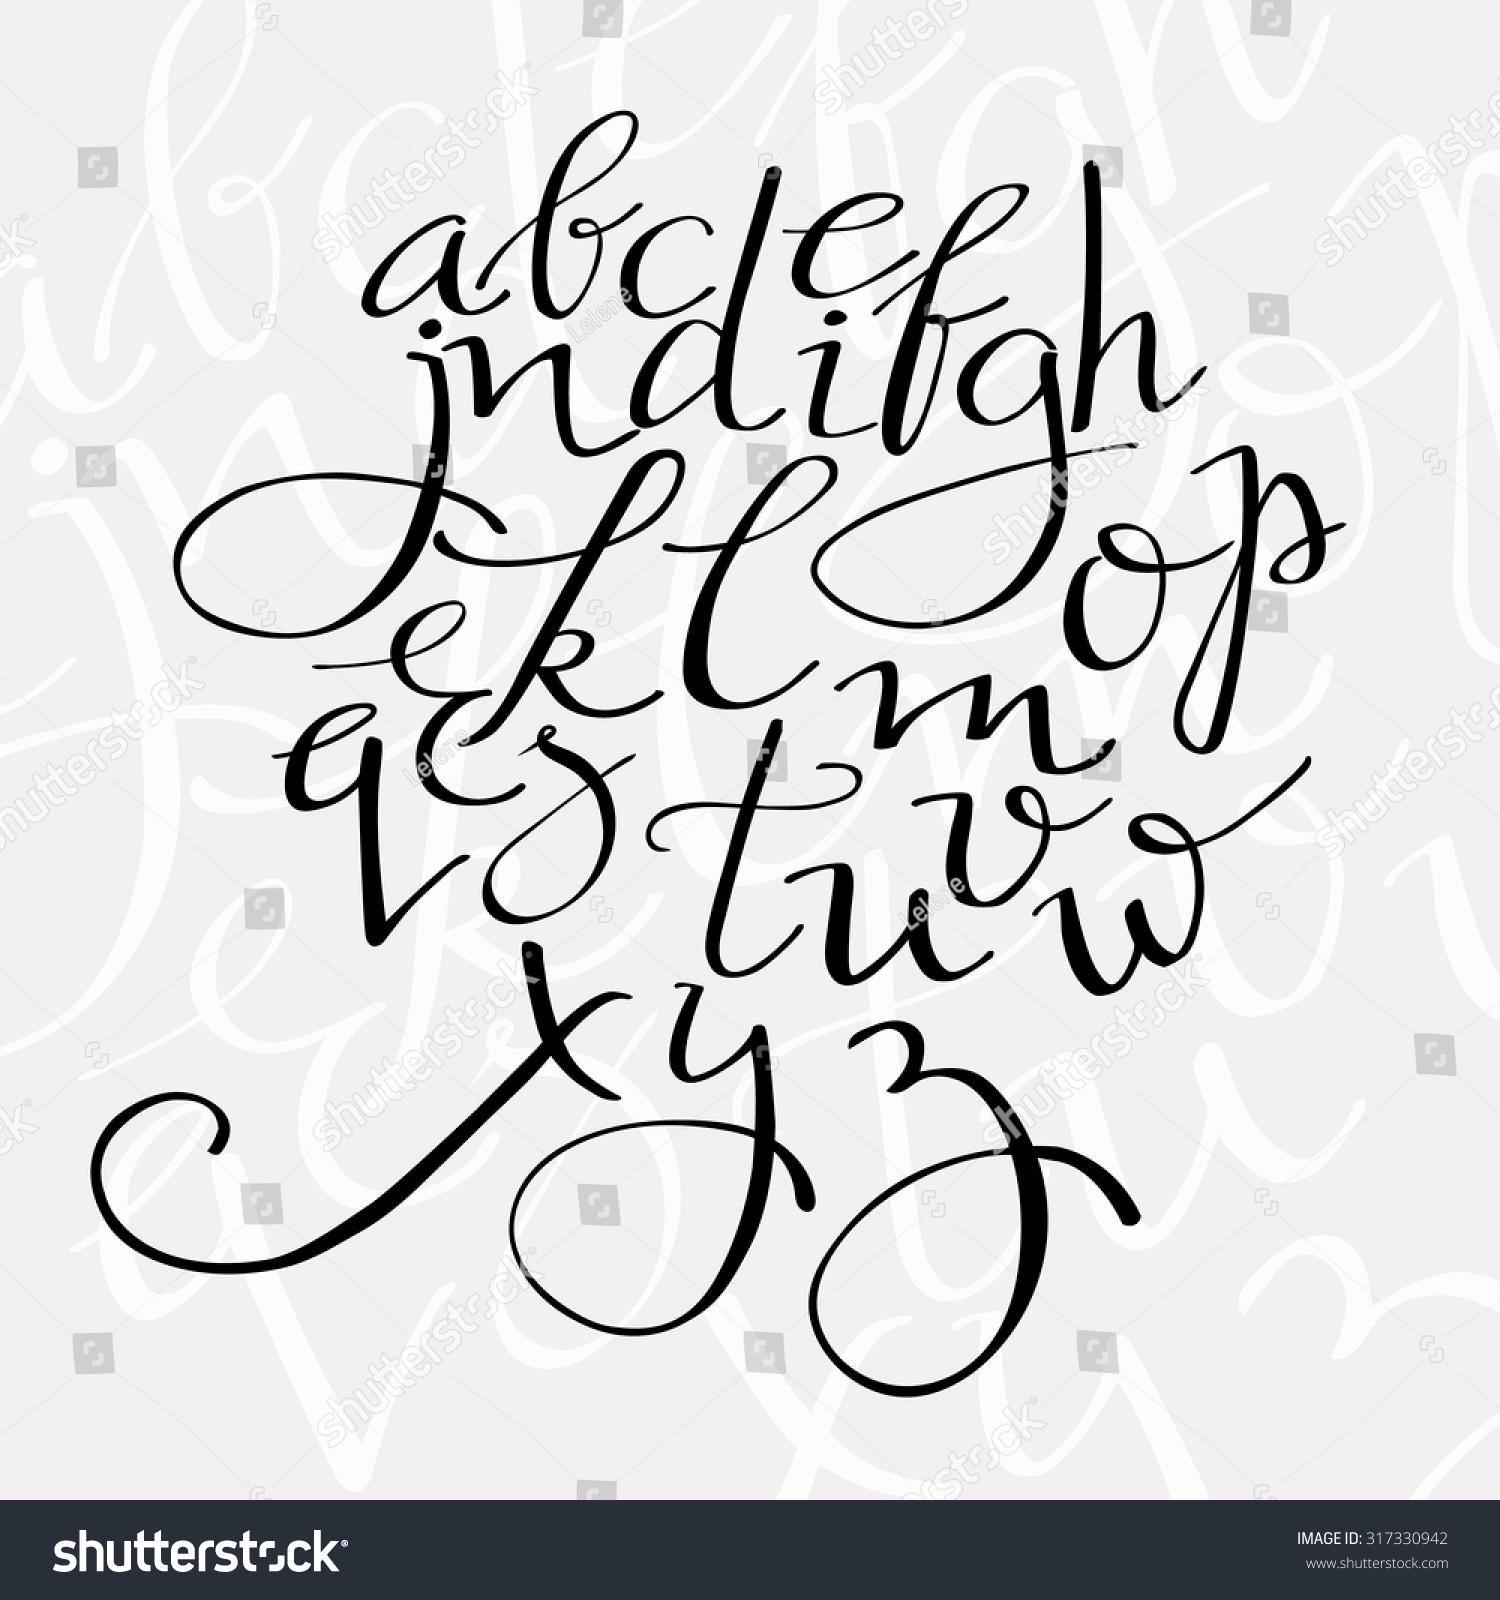 Pointed Pen Alphabet Flourish Script Vector Stock Vector HD (Royalty ...